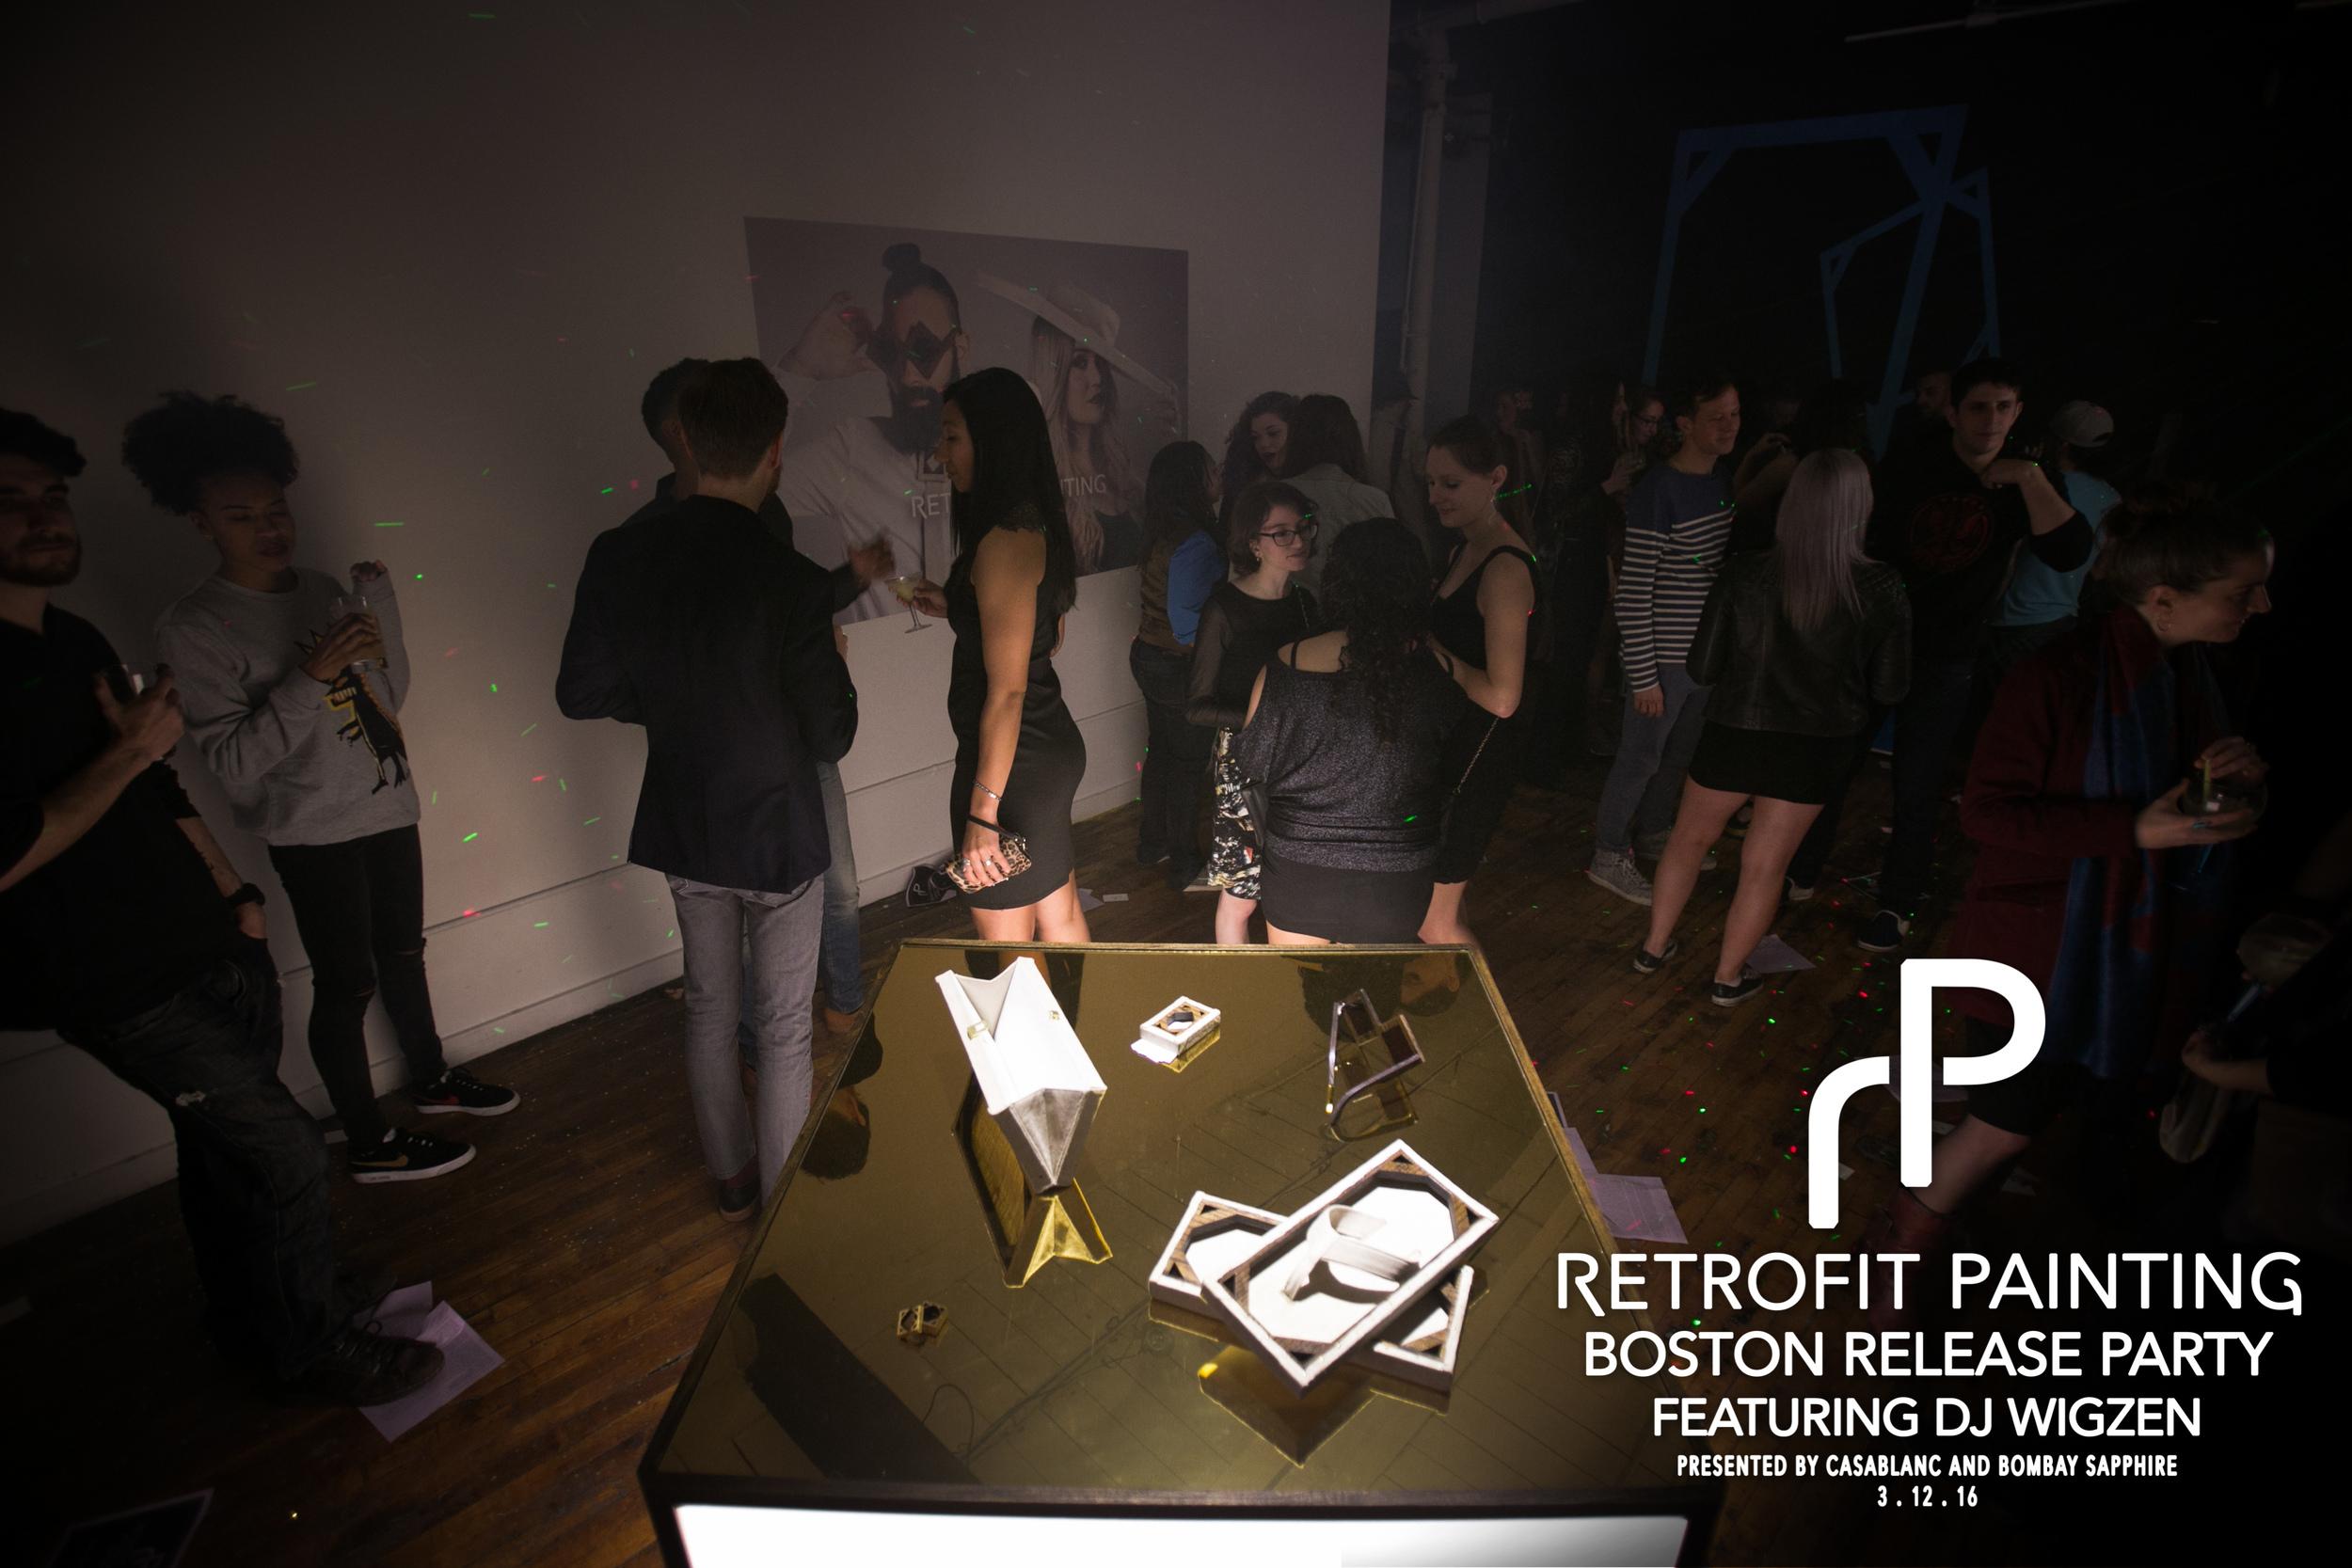 Retrofit Painting Boston Release Party 0205.jpg